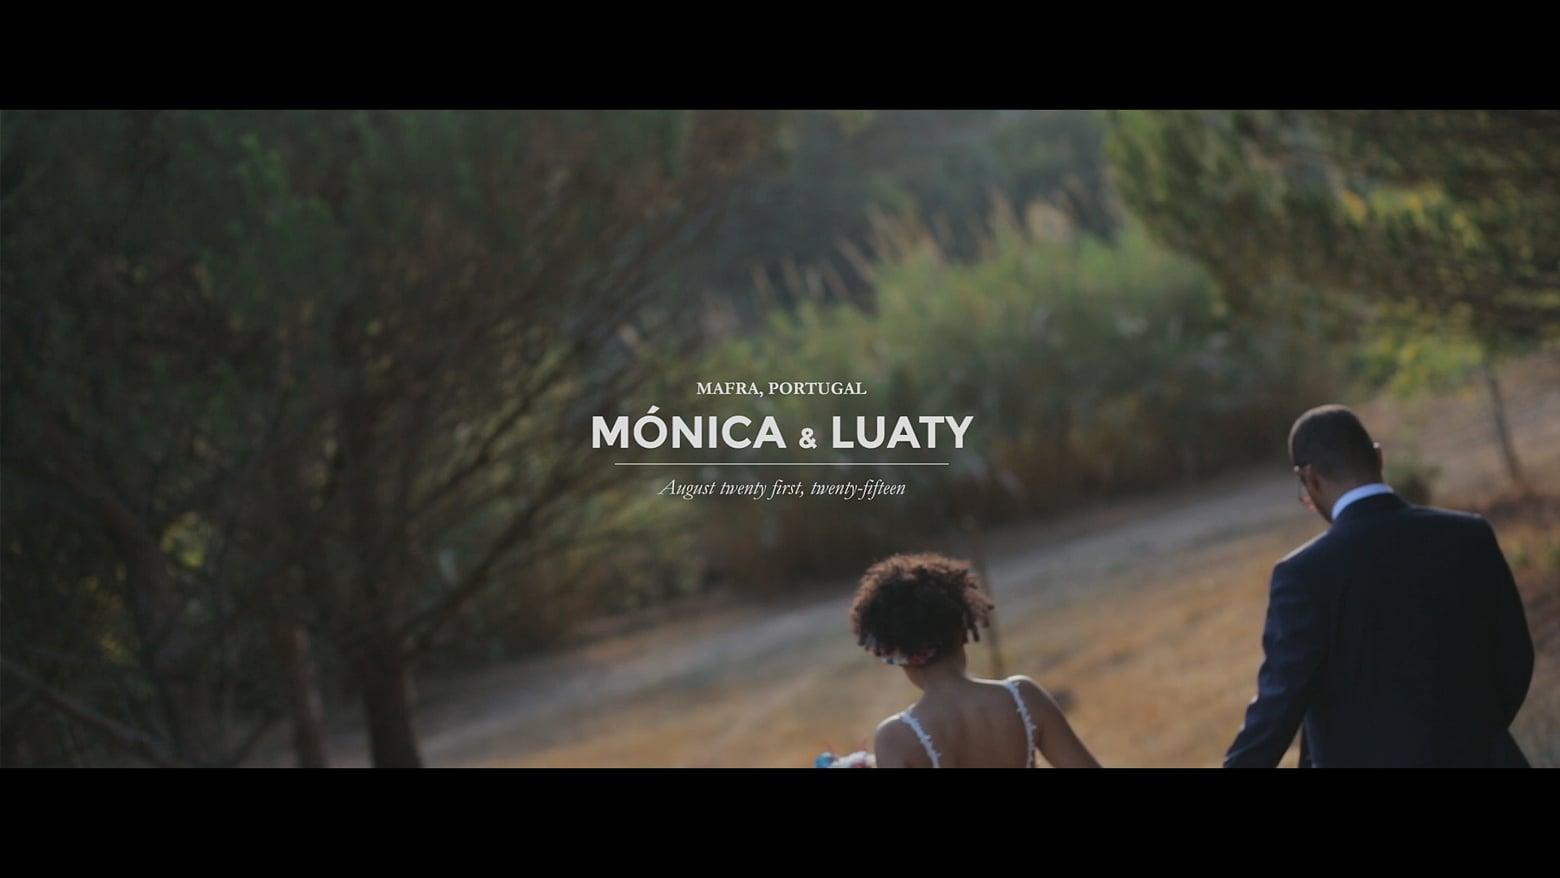 Mónica + Luaty | Mafra, Portugal | Casa de Reguengos